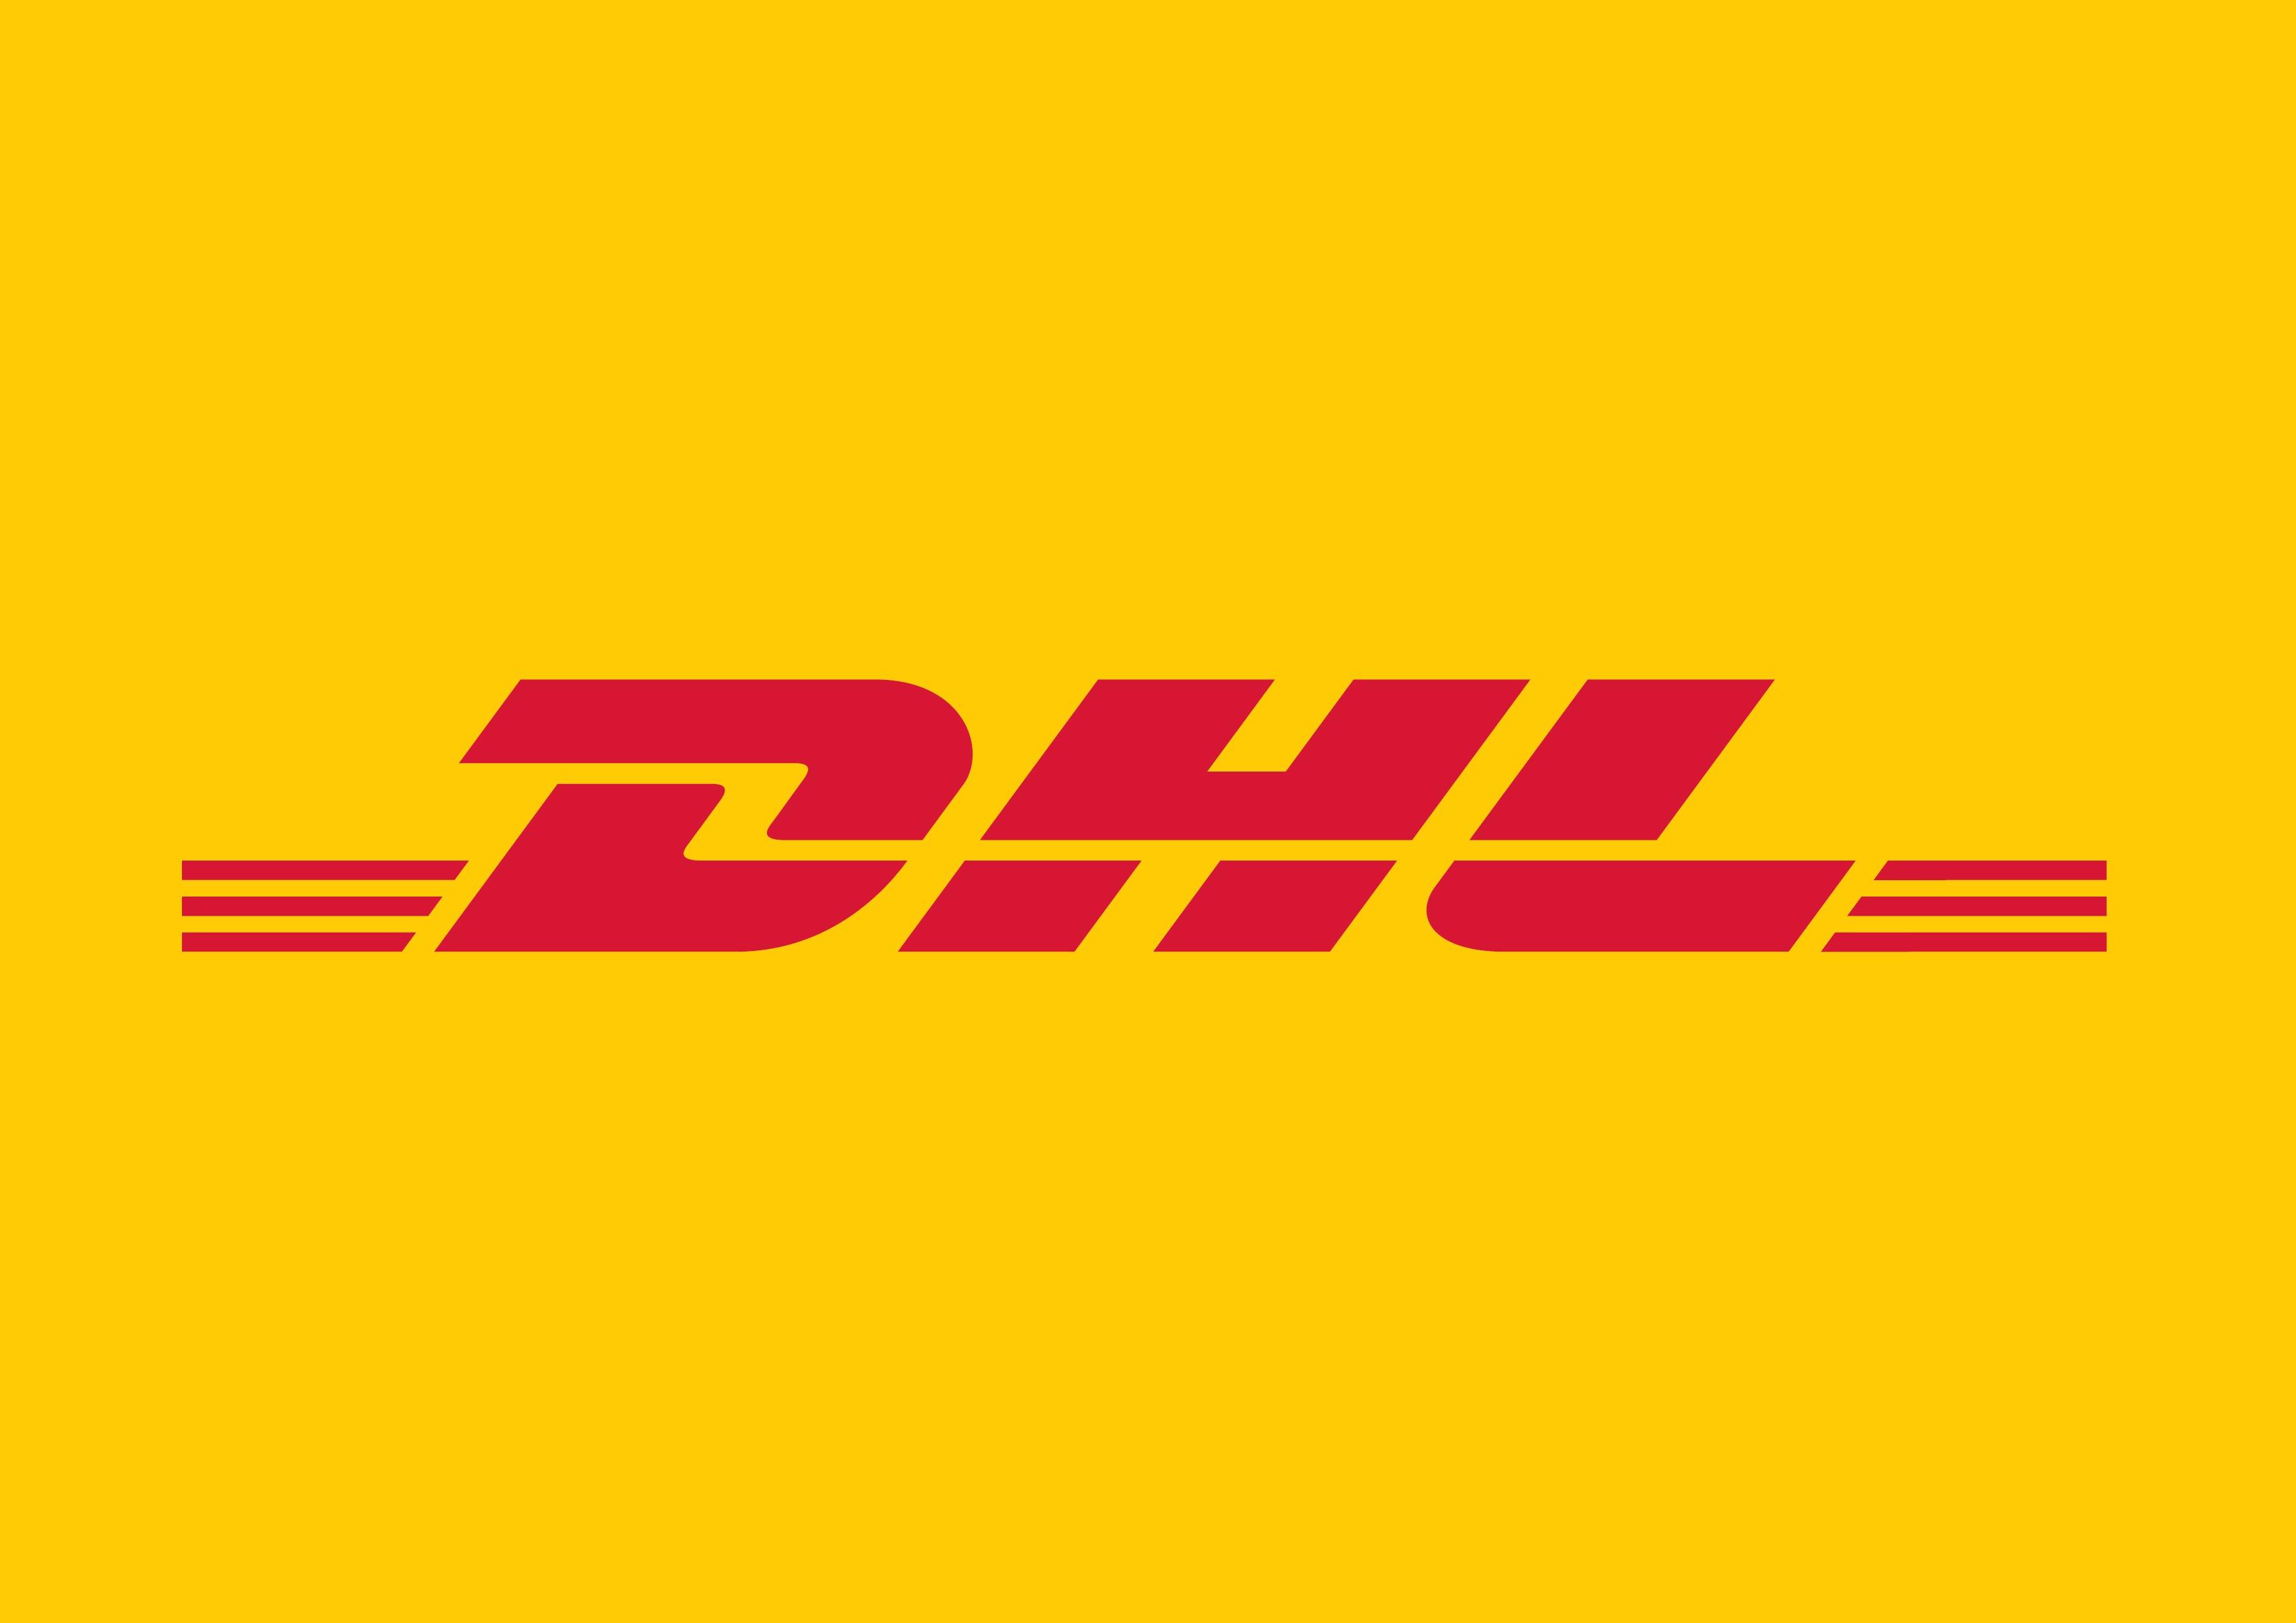 Логотип компании DHL